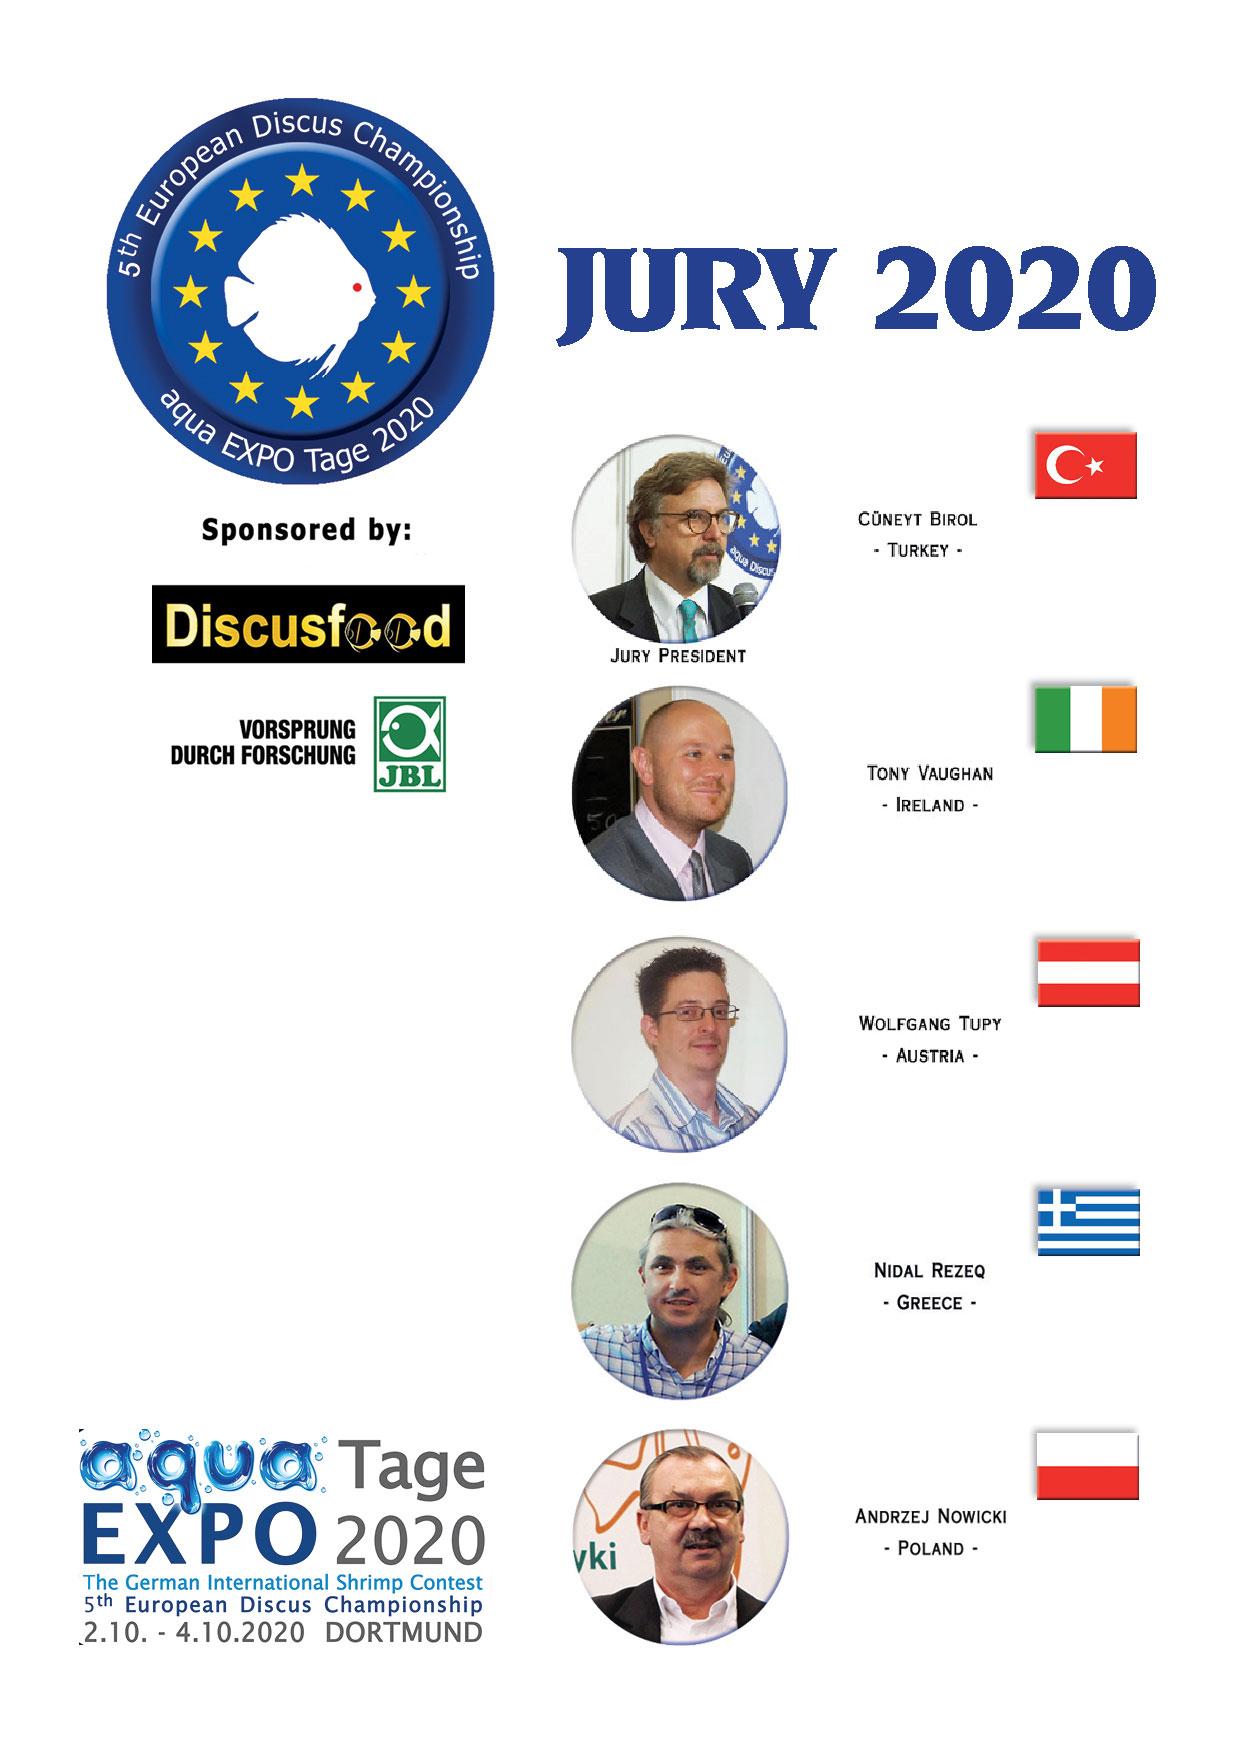 Jury - European Discus Championship